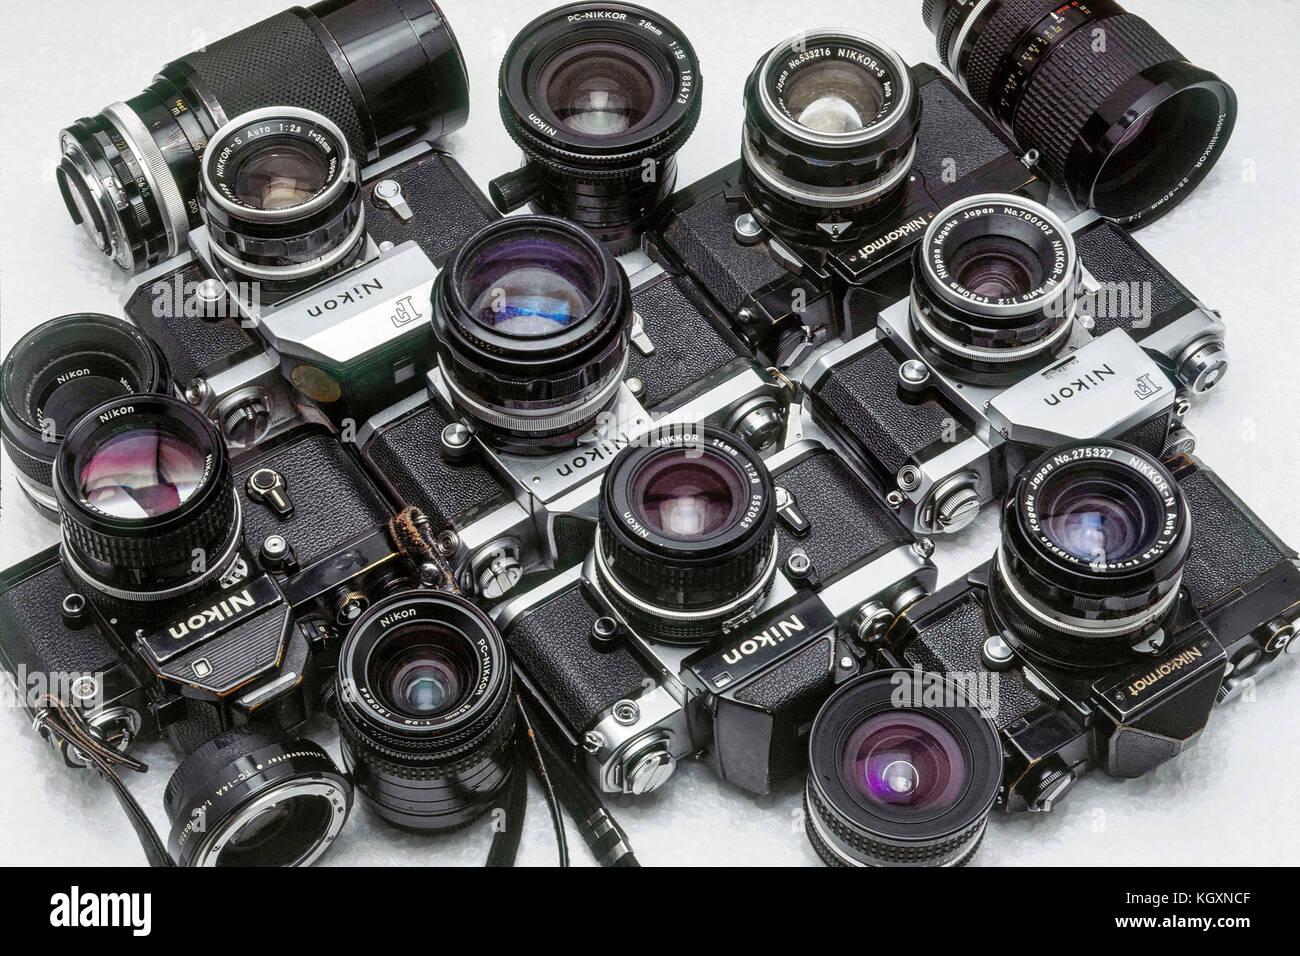 Nikon Cameras Stockfotos & Nikon Cameras Bilder - Alamy